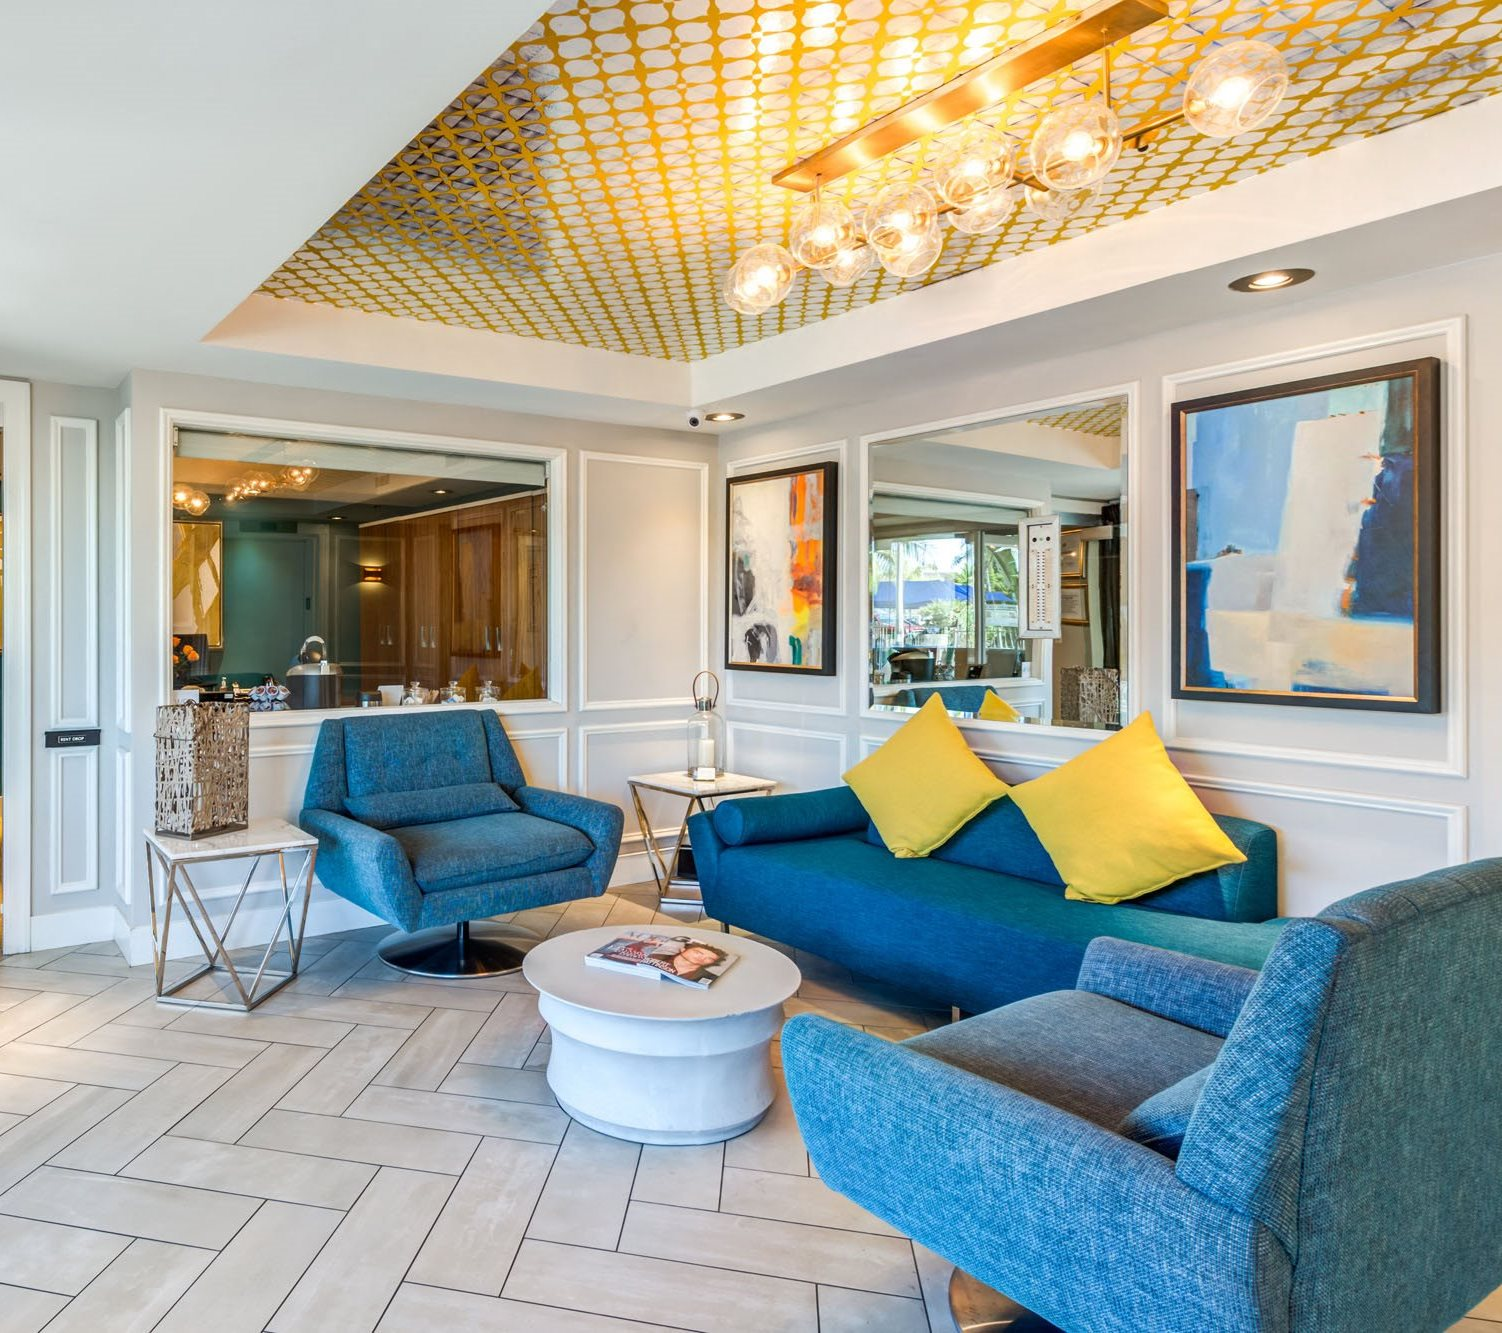 Madison Park Apartments California: Apartments In Los Angeles, CA